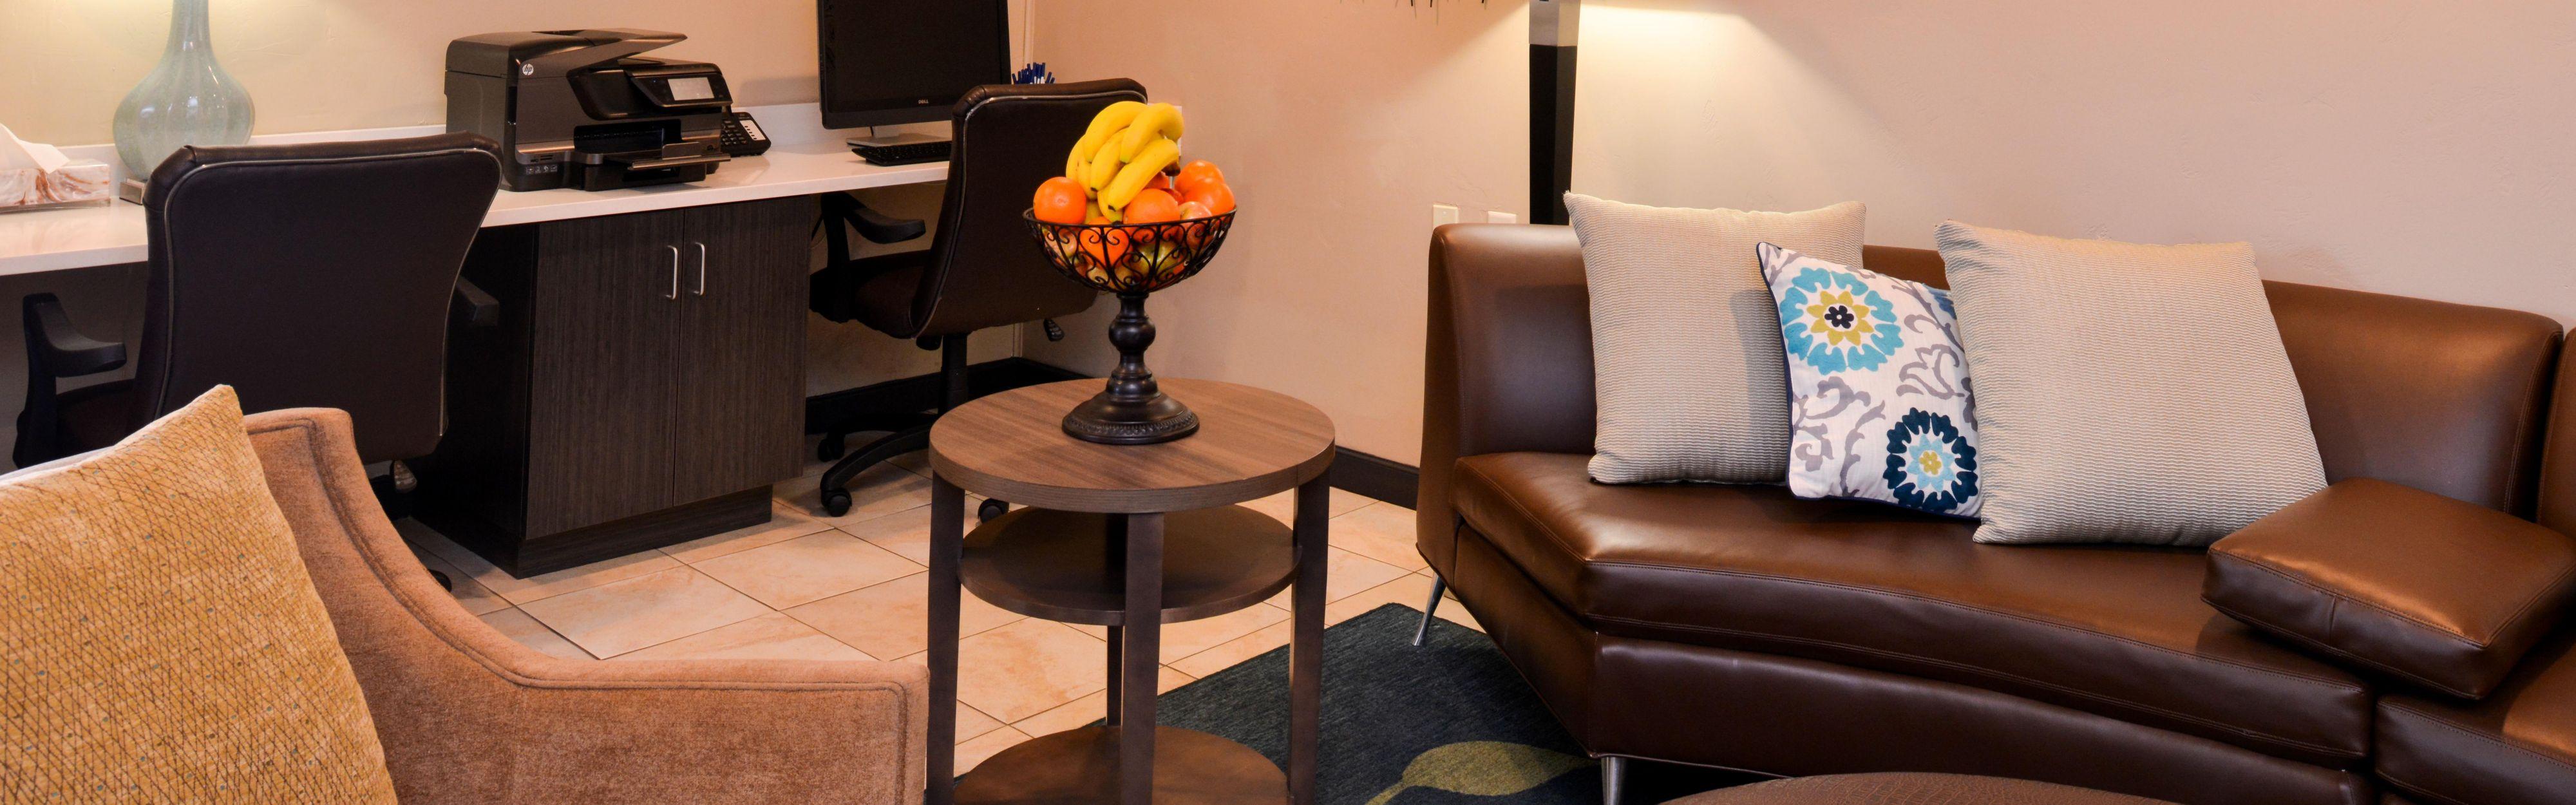 Candlewood Suites Boise-Meridian image 0